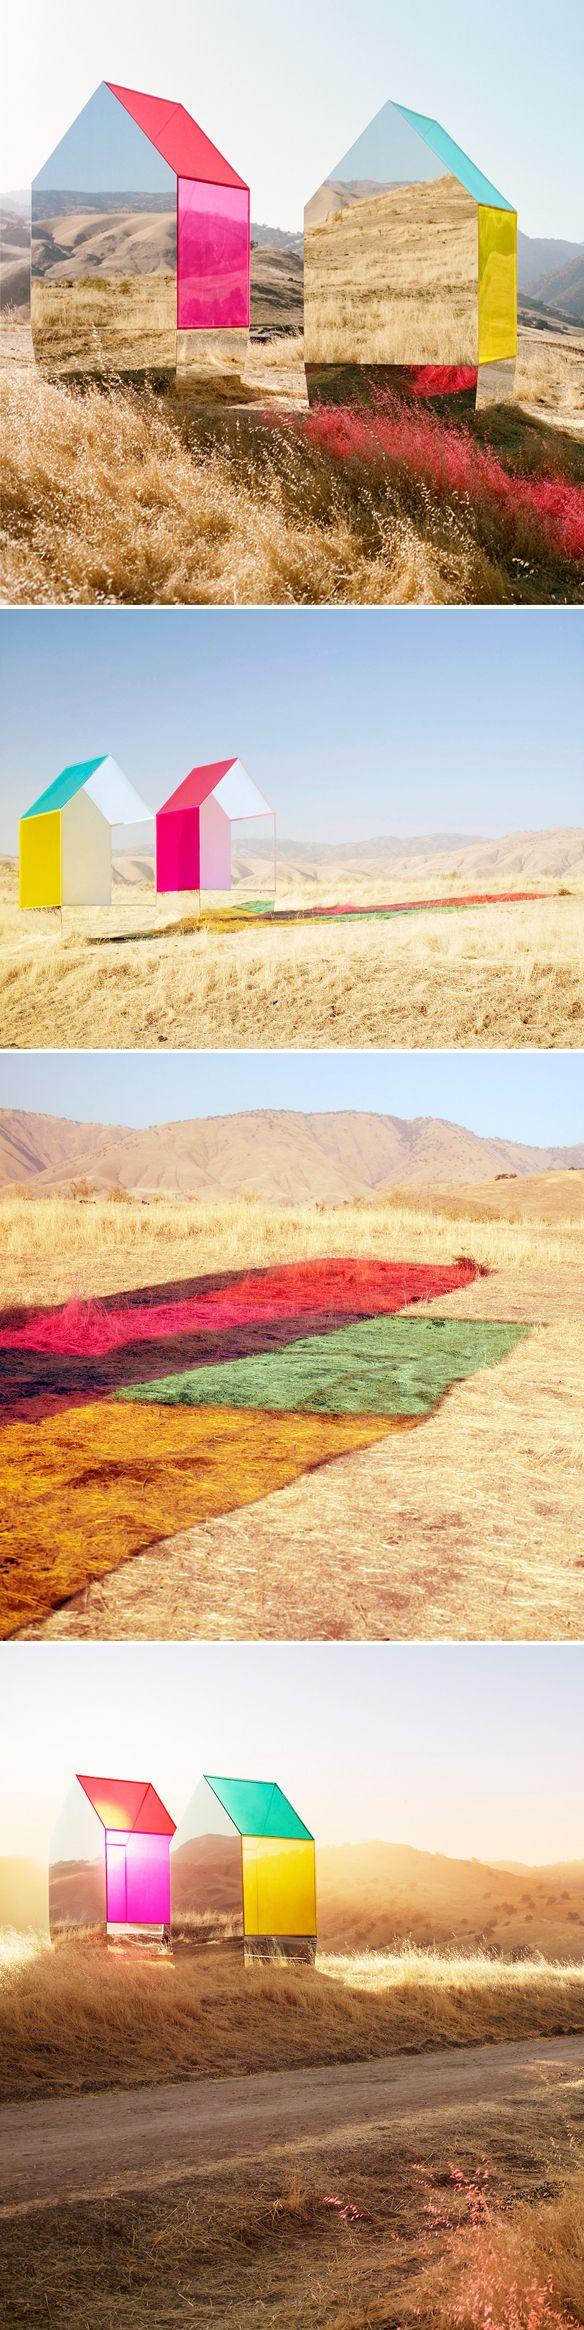 Pin Ups: Glass Houses Art| knittedbliss.com